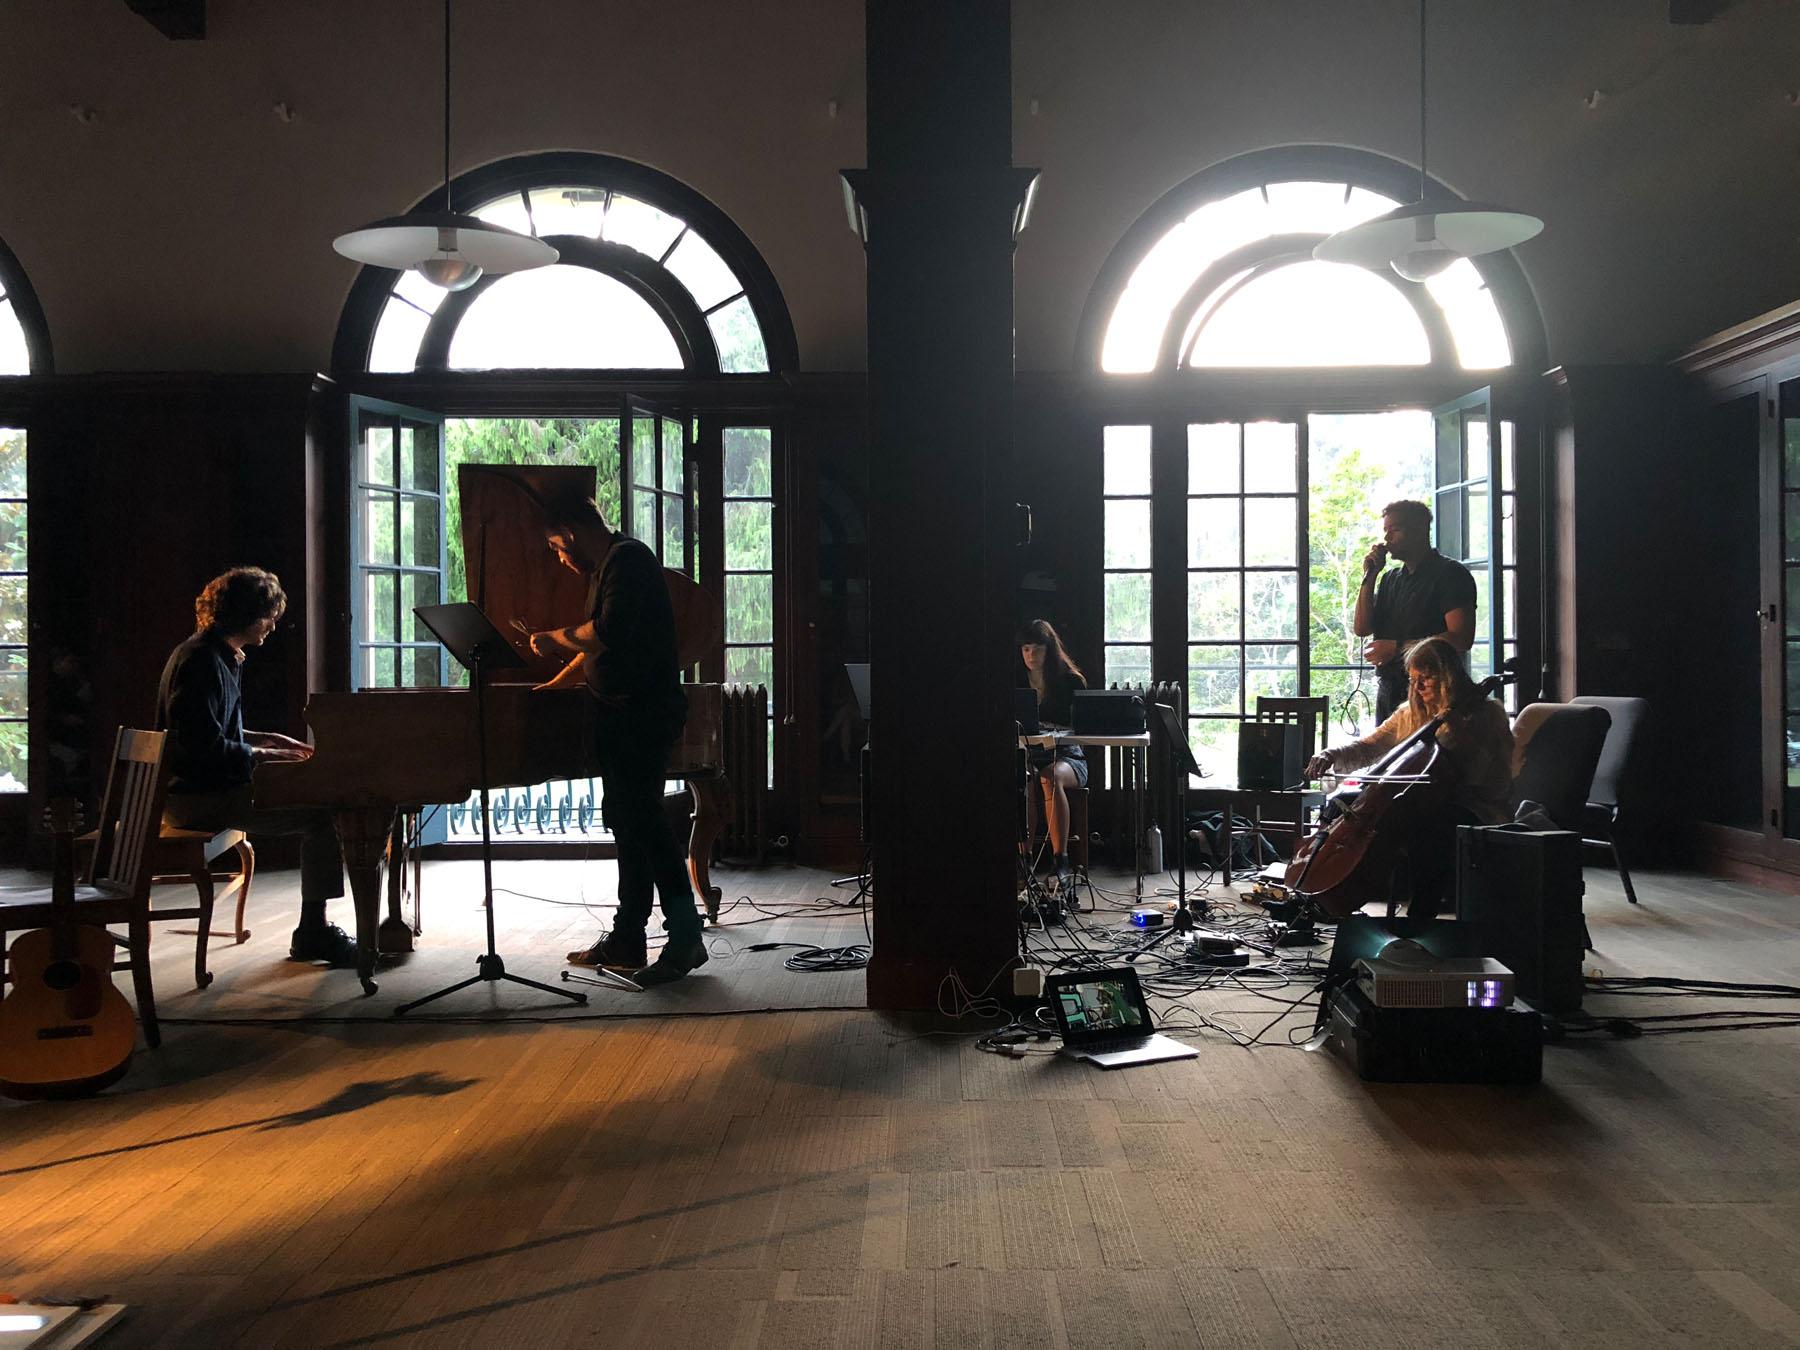 Stains for Cello and Piano , Kris Force with Brendan Glasson, Sally Decker, Tony Gennaro, and Rodolfo Córdova.